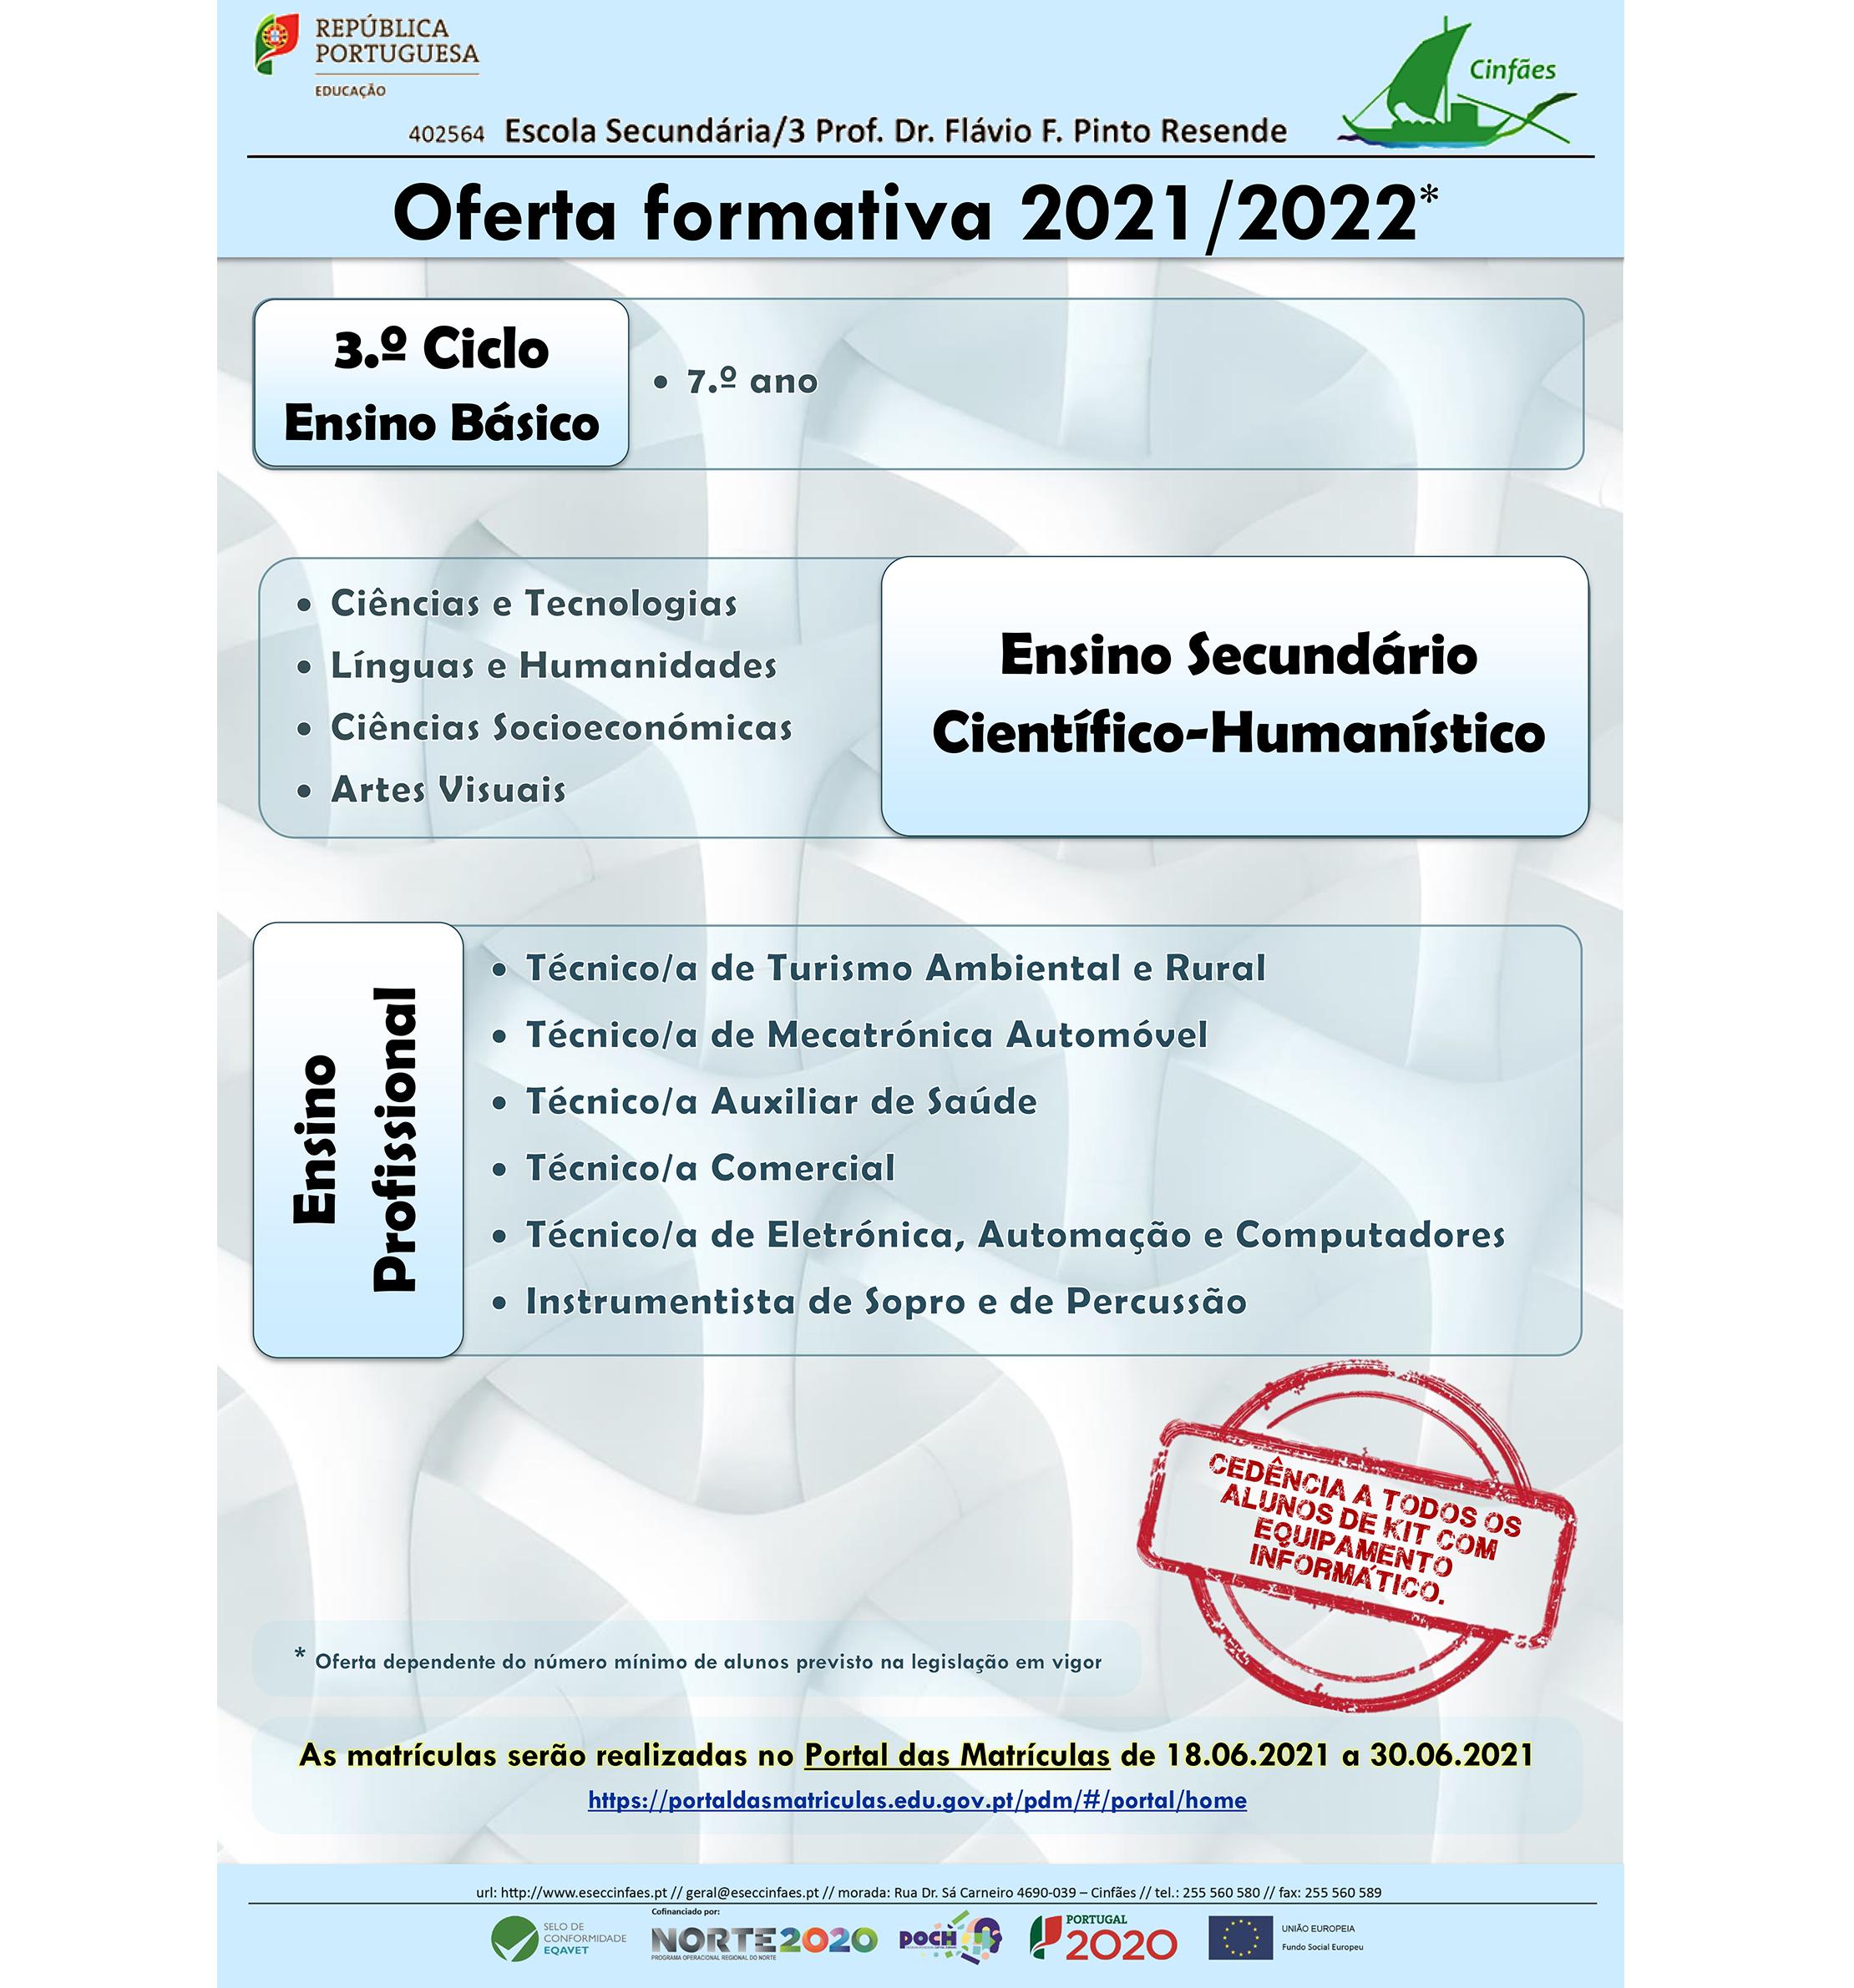 Oferta Formativa 2021/2022